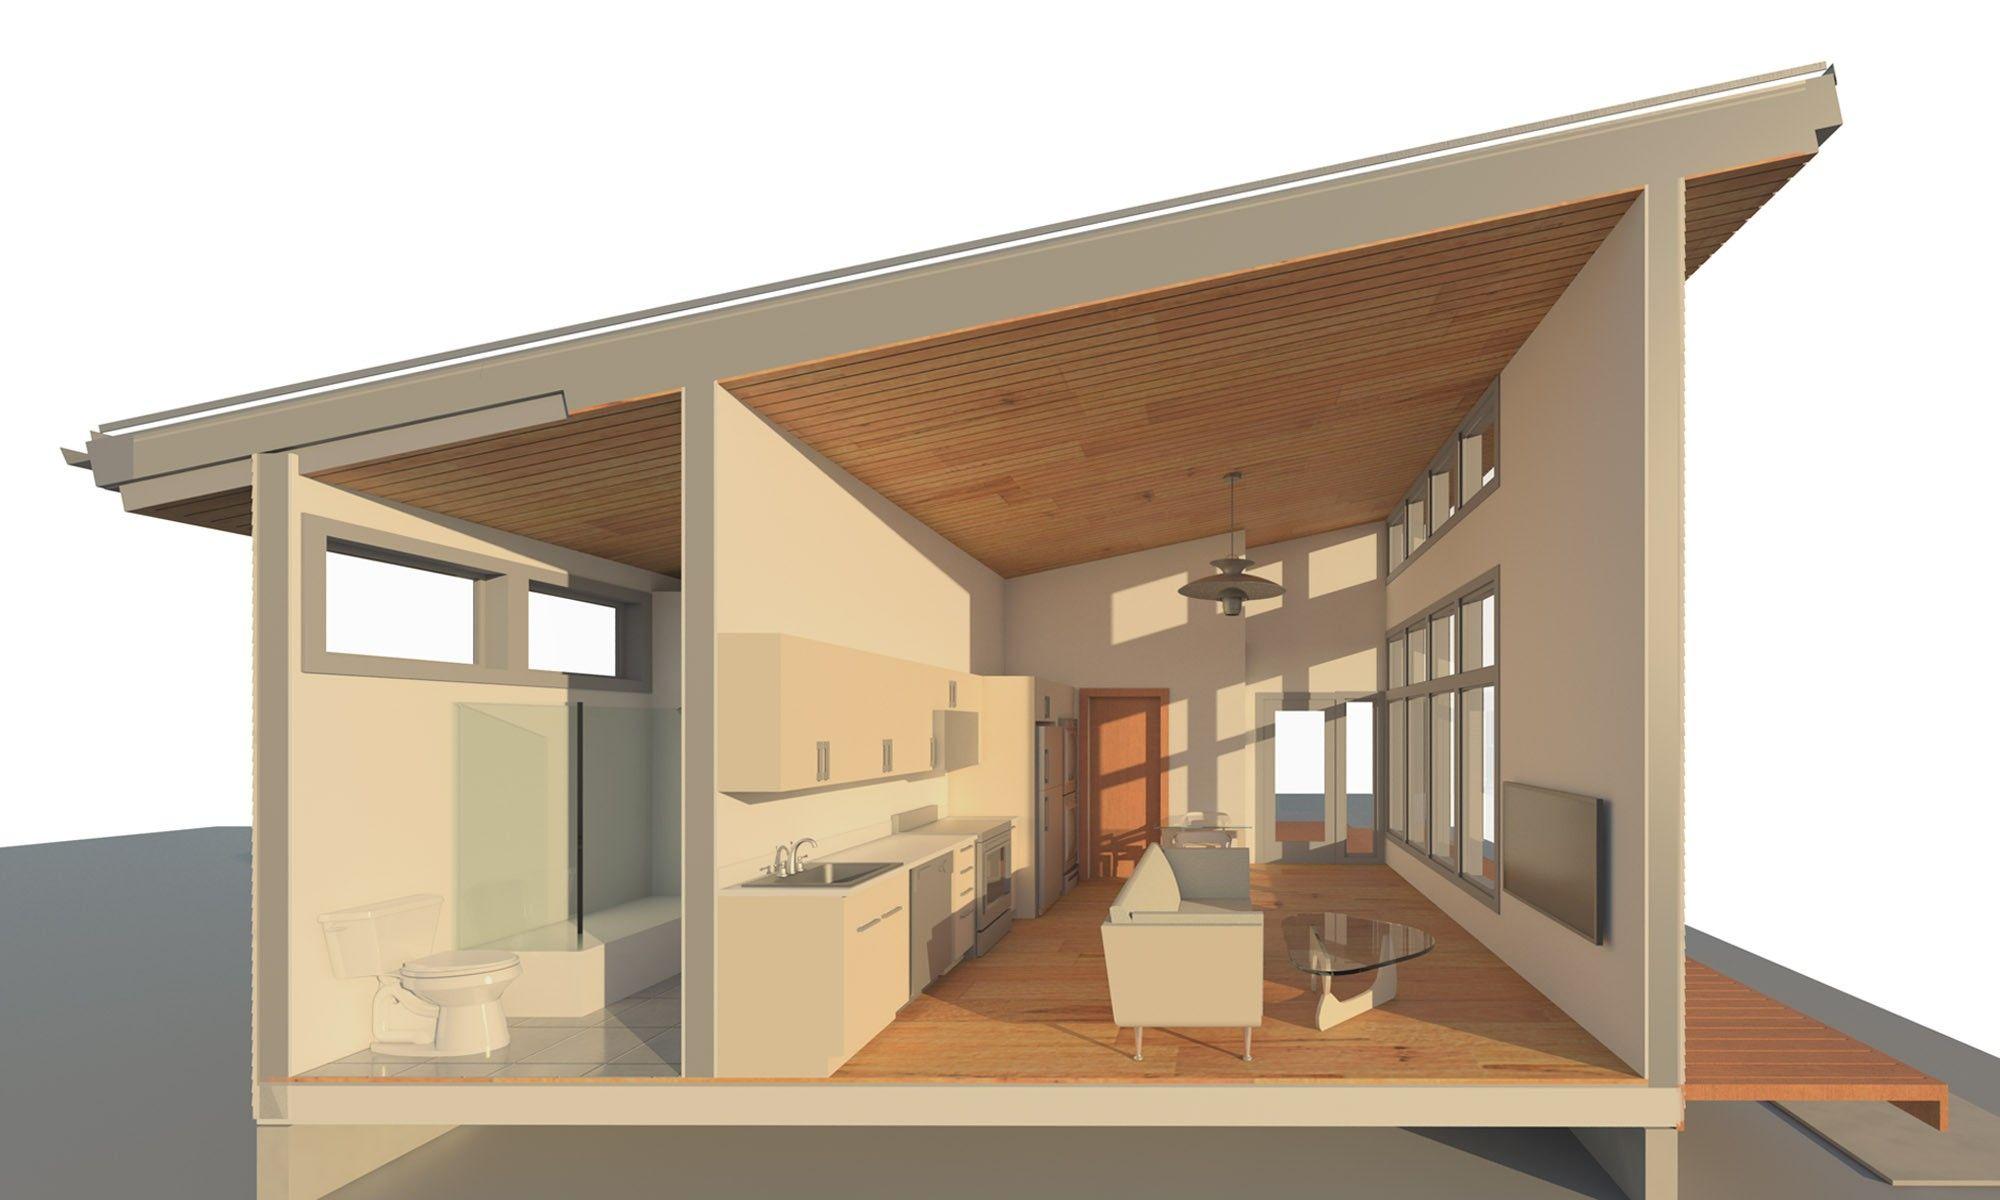 Portland ADU Accessory Dwelling Unit by Propel Studio - Floor plan ...